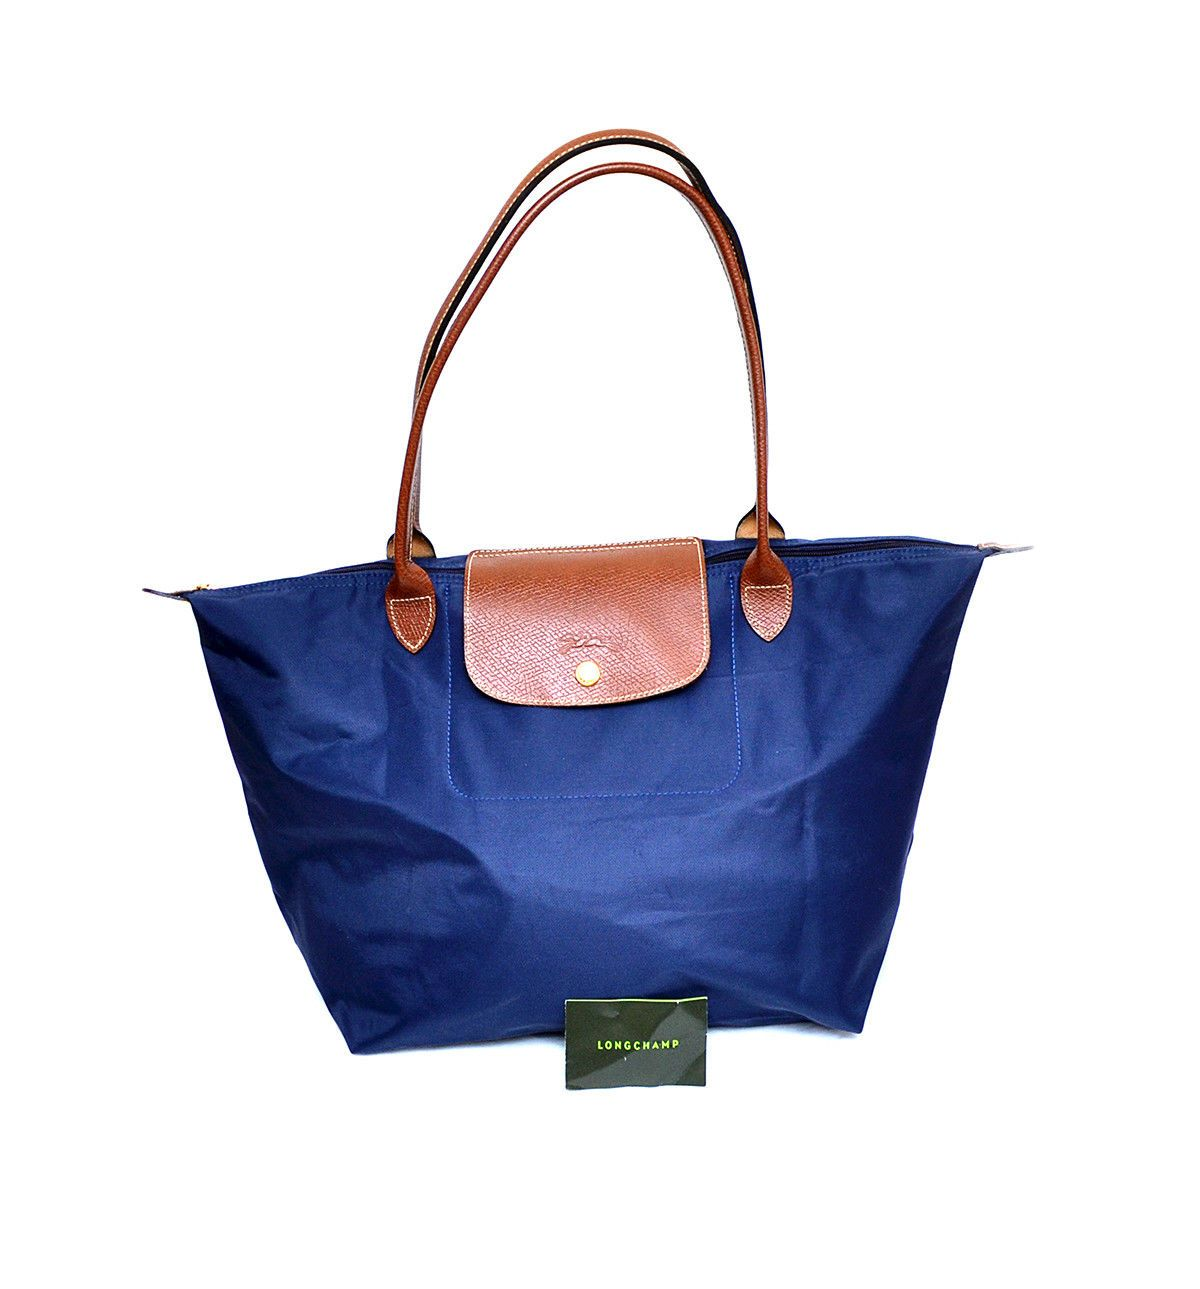 2931ec7cb My eBay Active Longchamp, My Ebay, Tote Bag, Carry Bag, Tote Bags